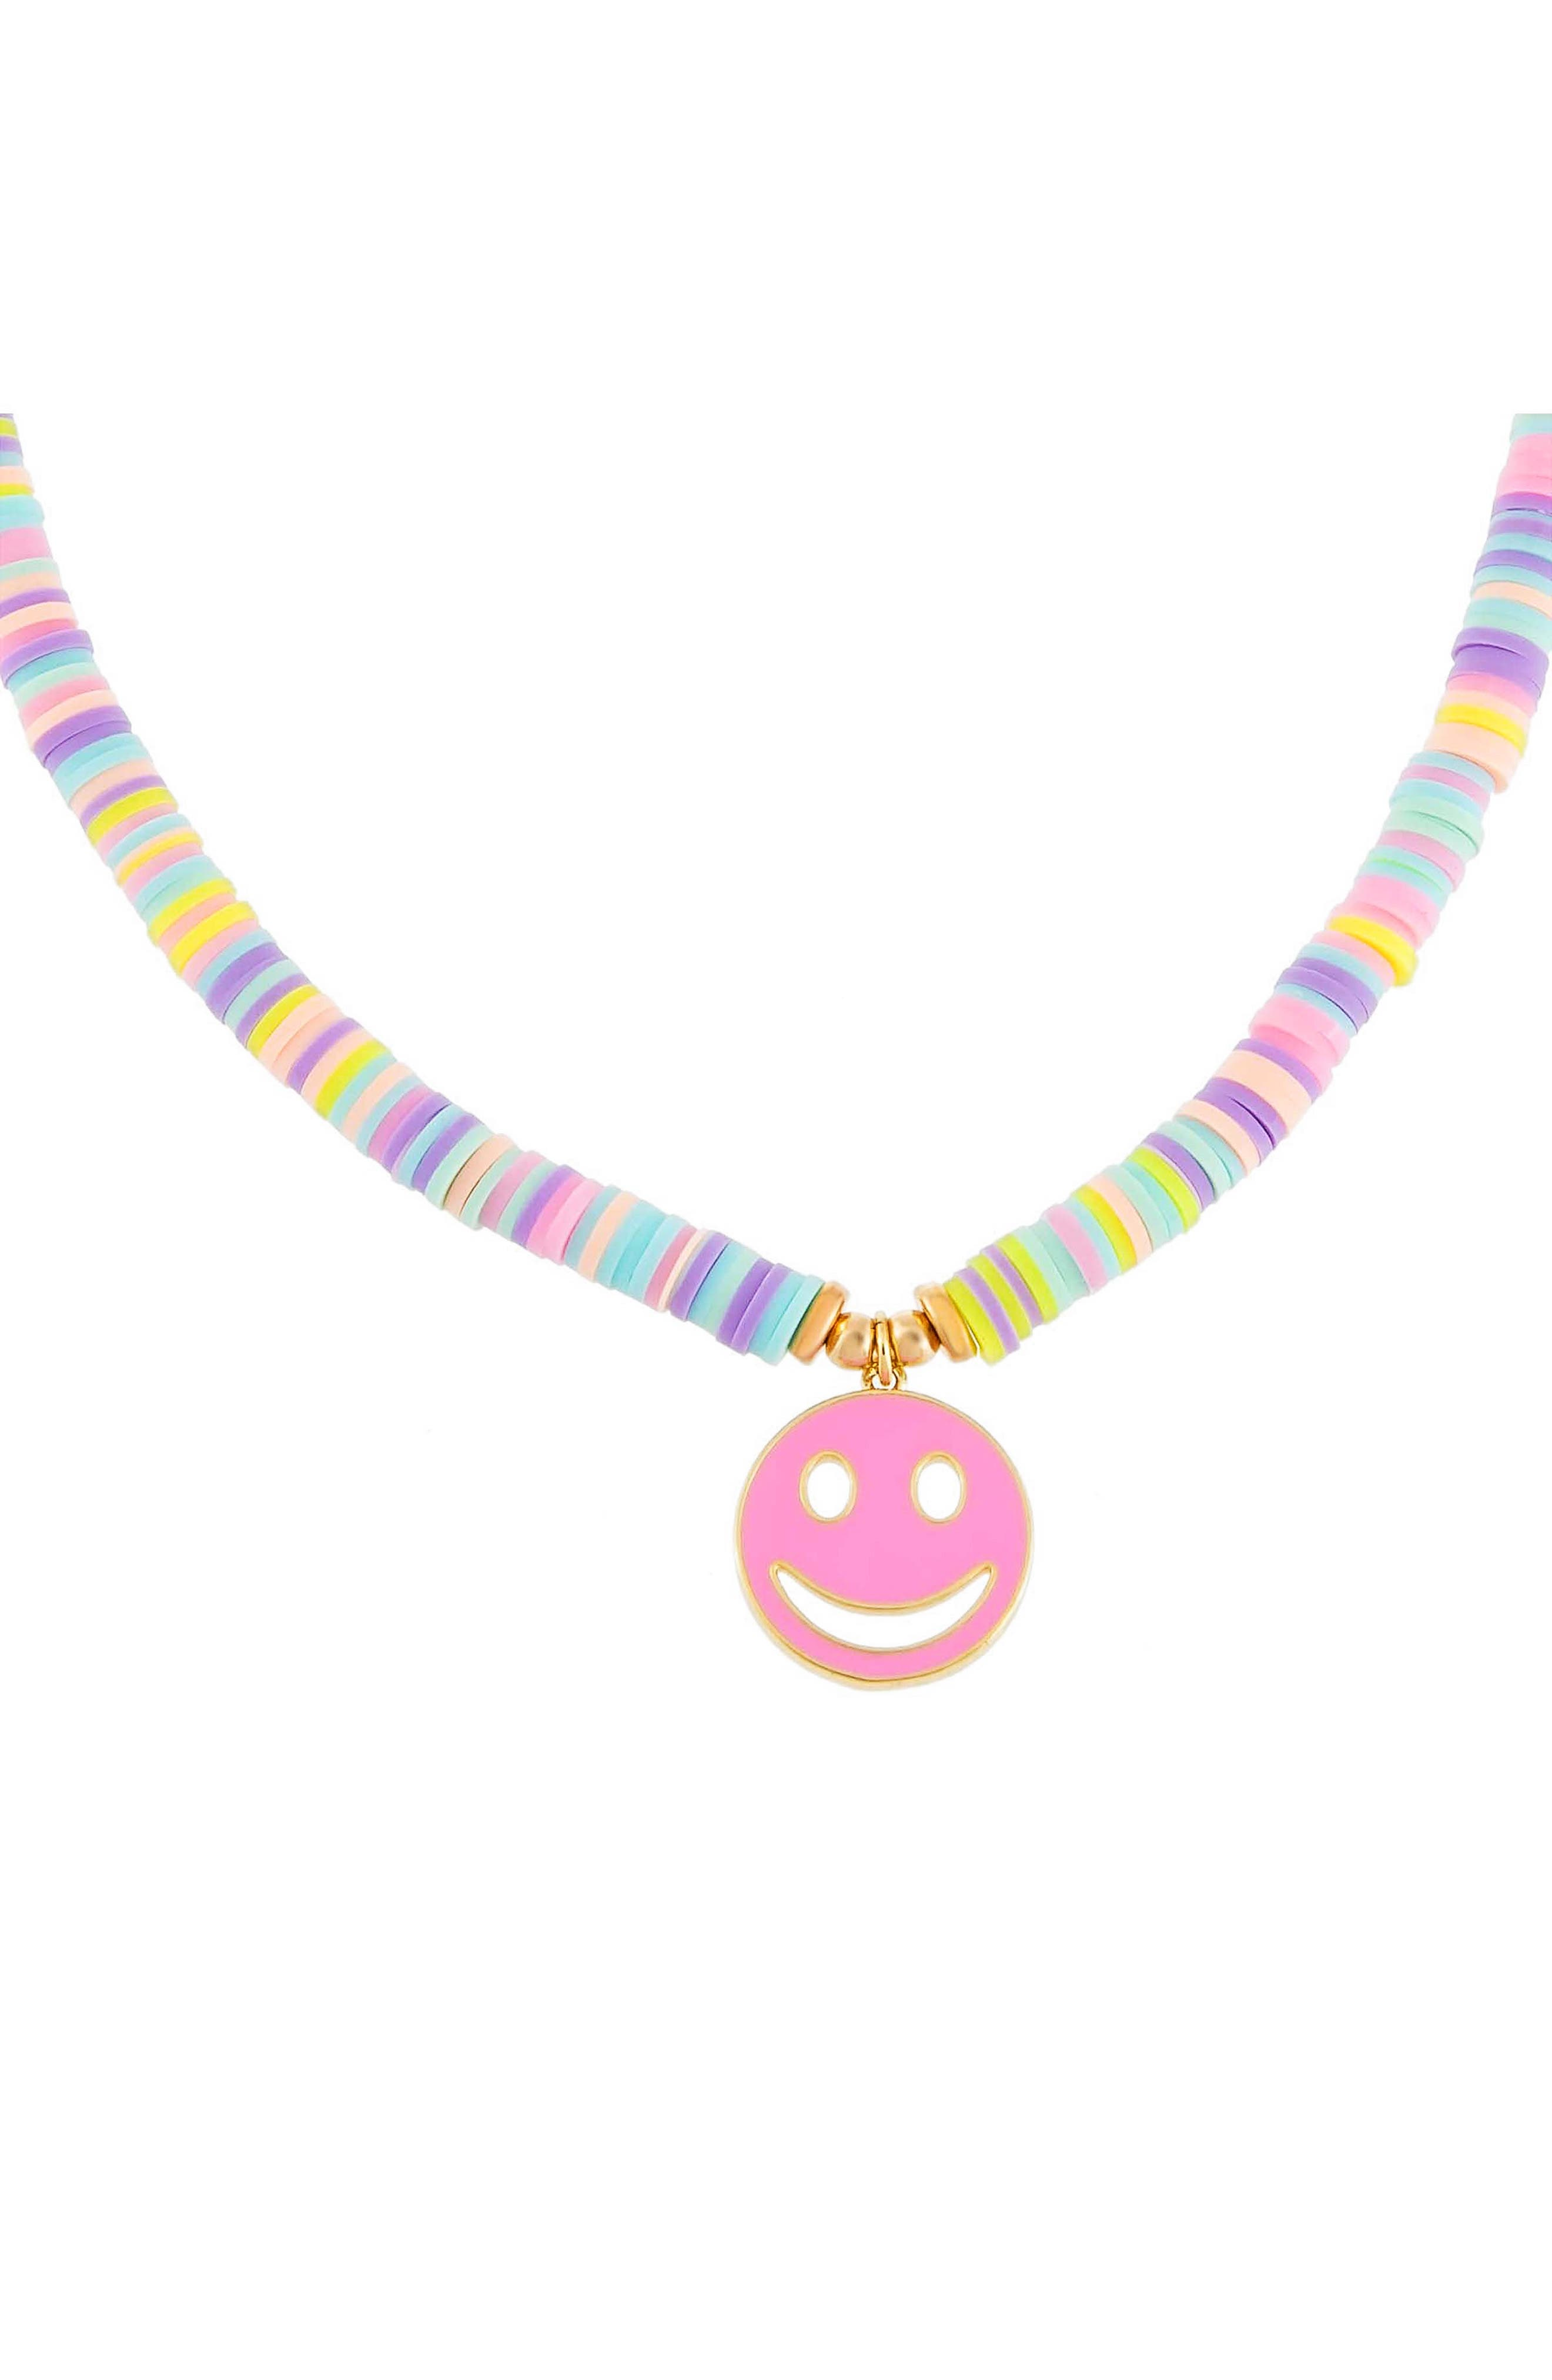 Women's Adina's Jewels Beaded Smiley Face Pendant Necklace